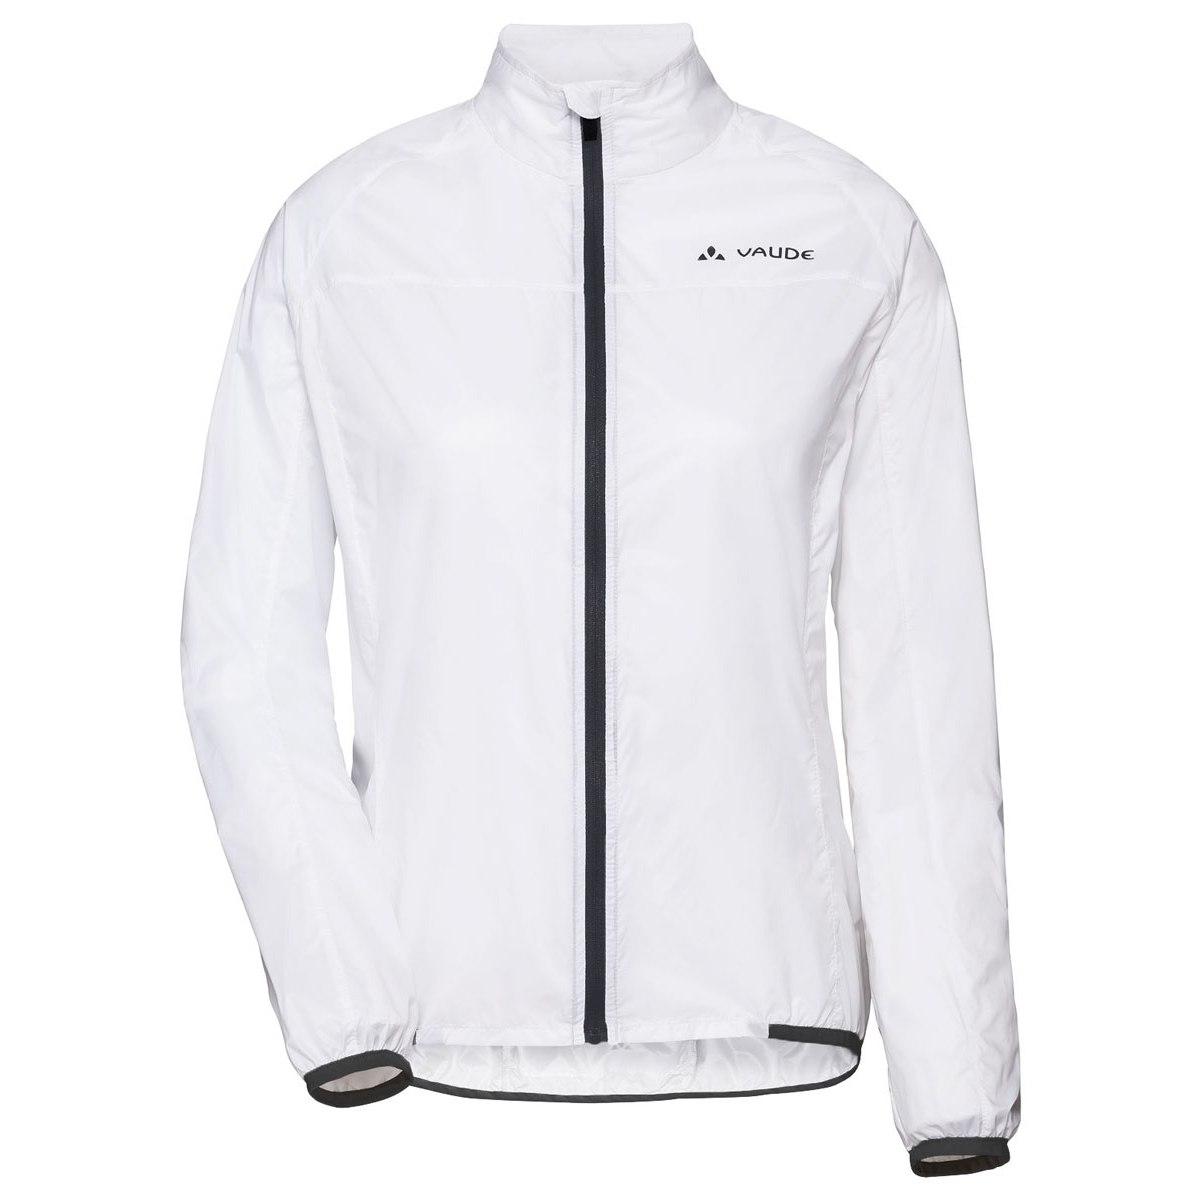 Vaude Air Damenjacke III - weiß uni